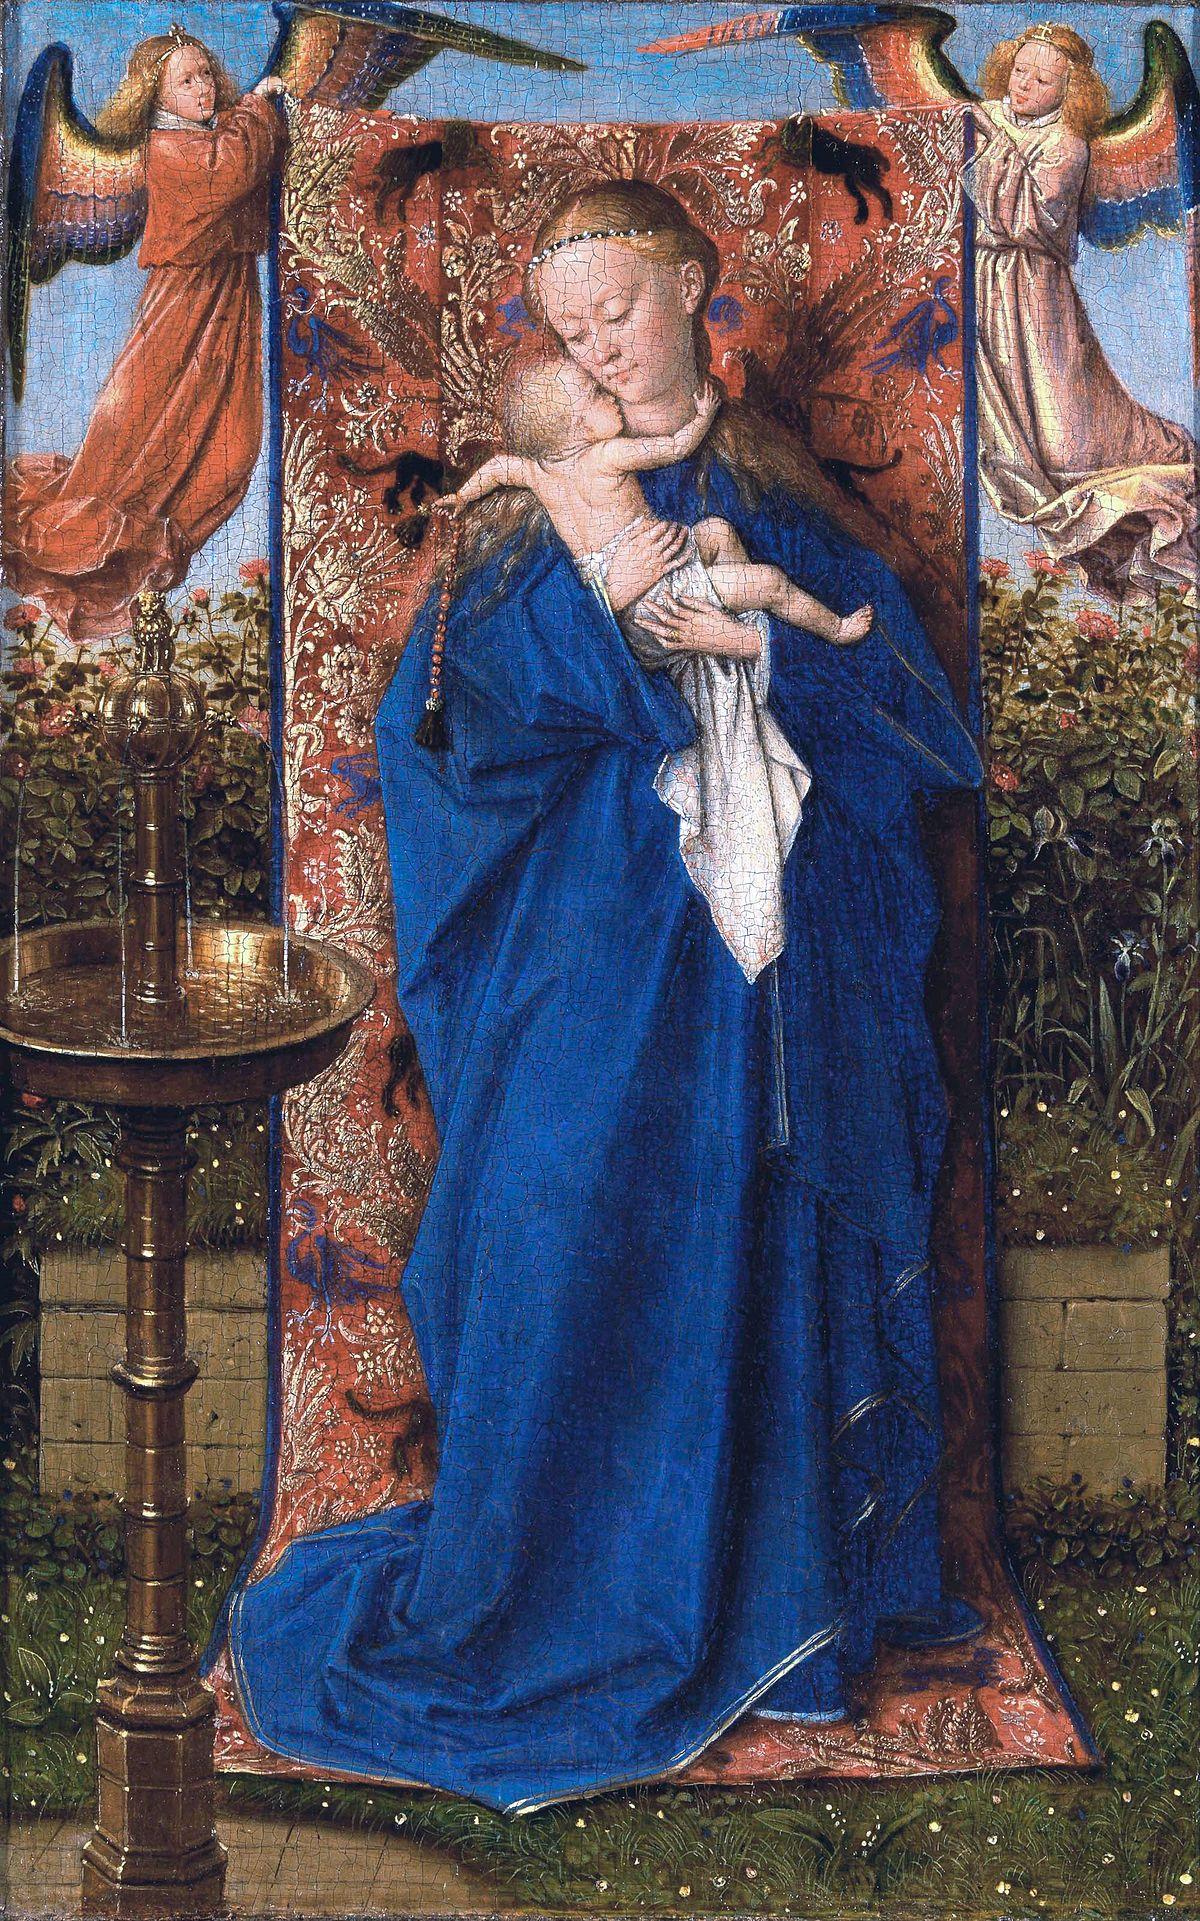 jan van eyck madonna in the Jan van eyck jan van eyck (also known as johannes de eyck) was a famous flemish artist prominent in bruges and respected as one.